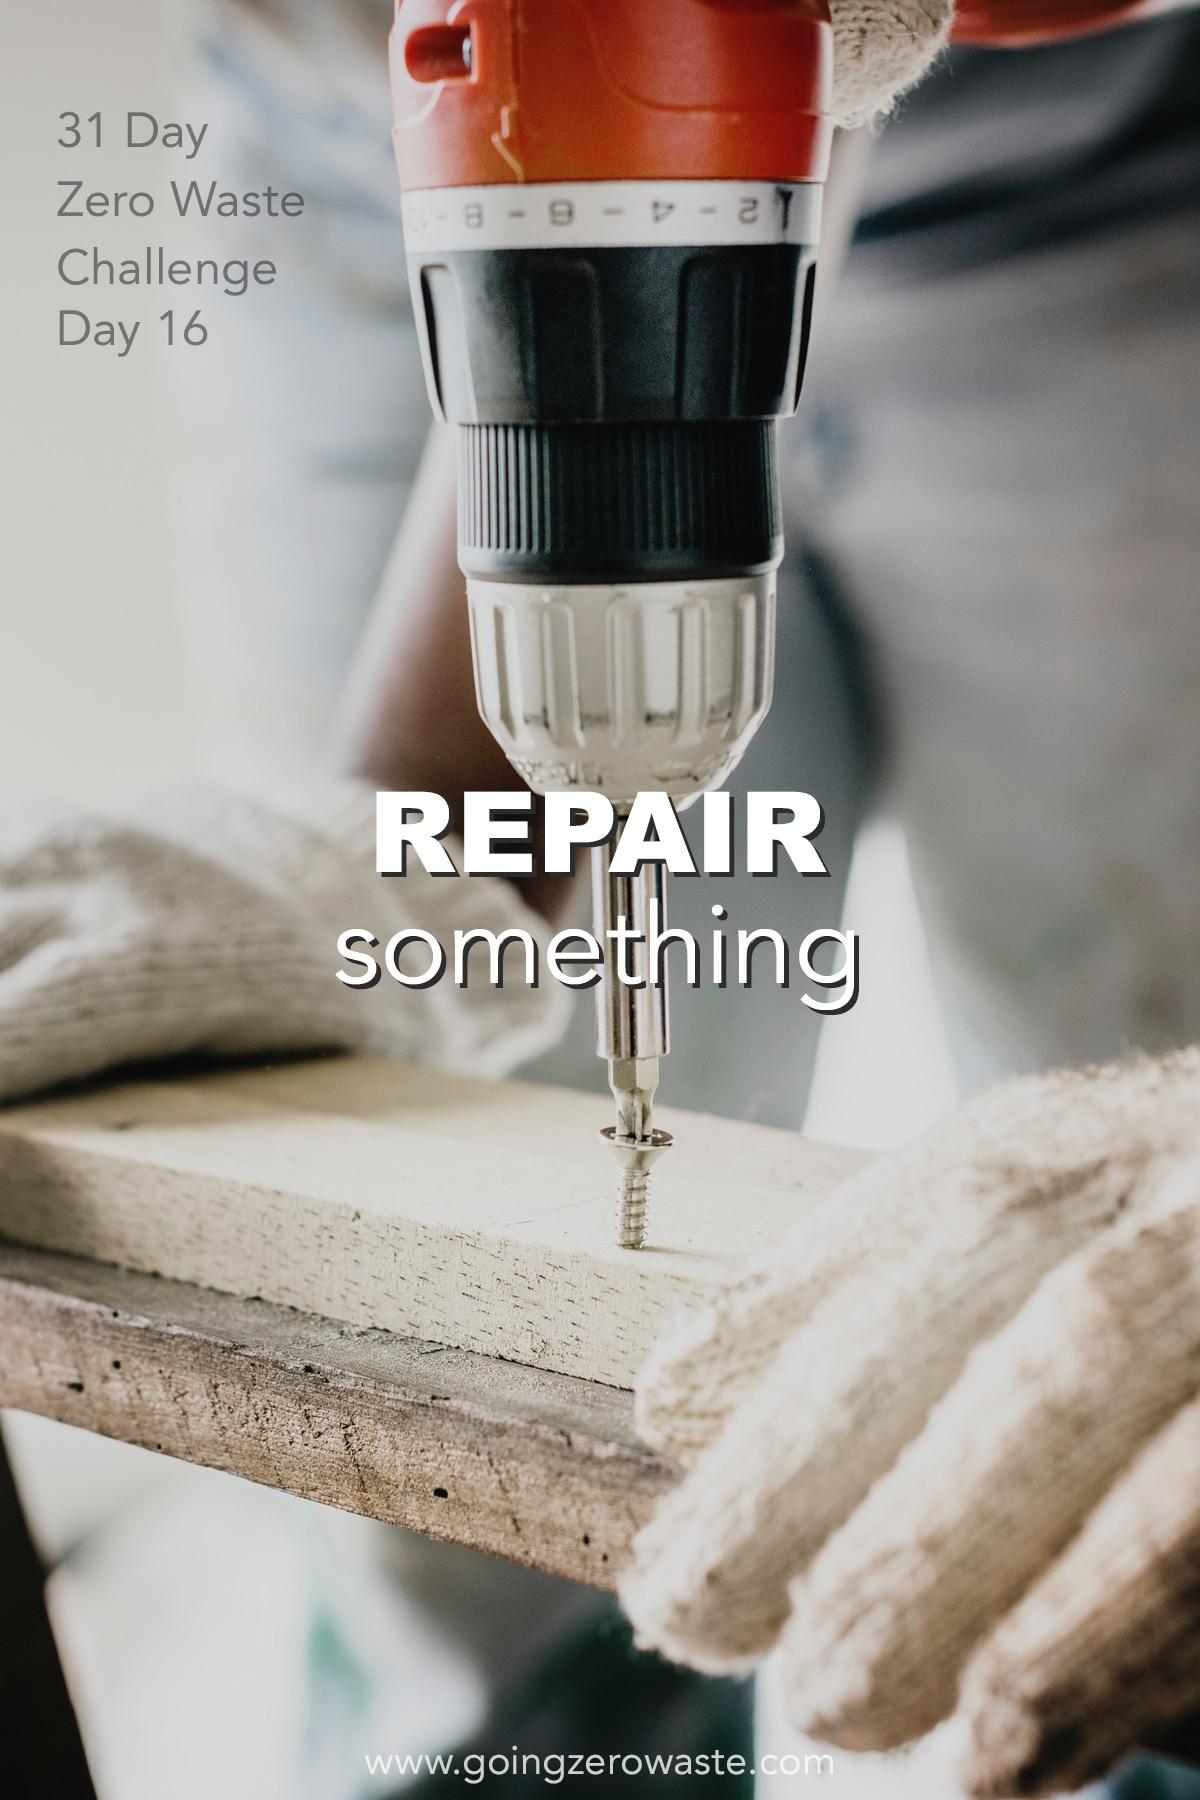 Repair Something - Day 16 of the Zero Waste Challenge